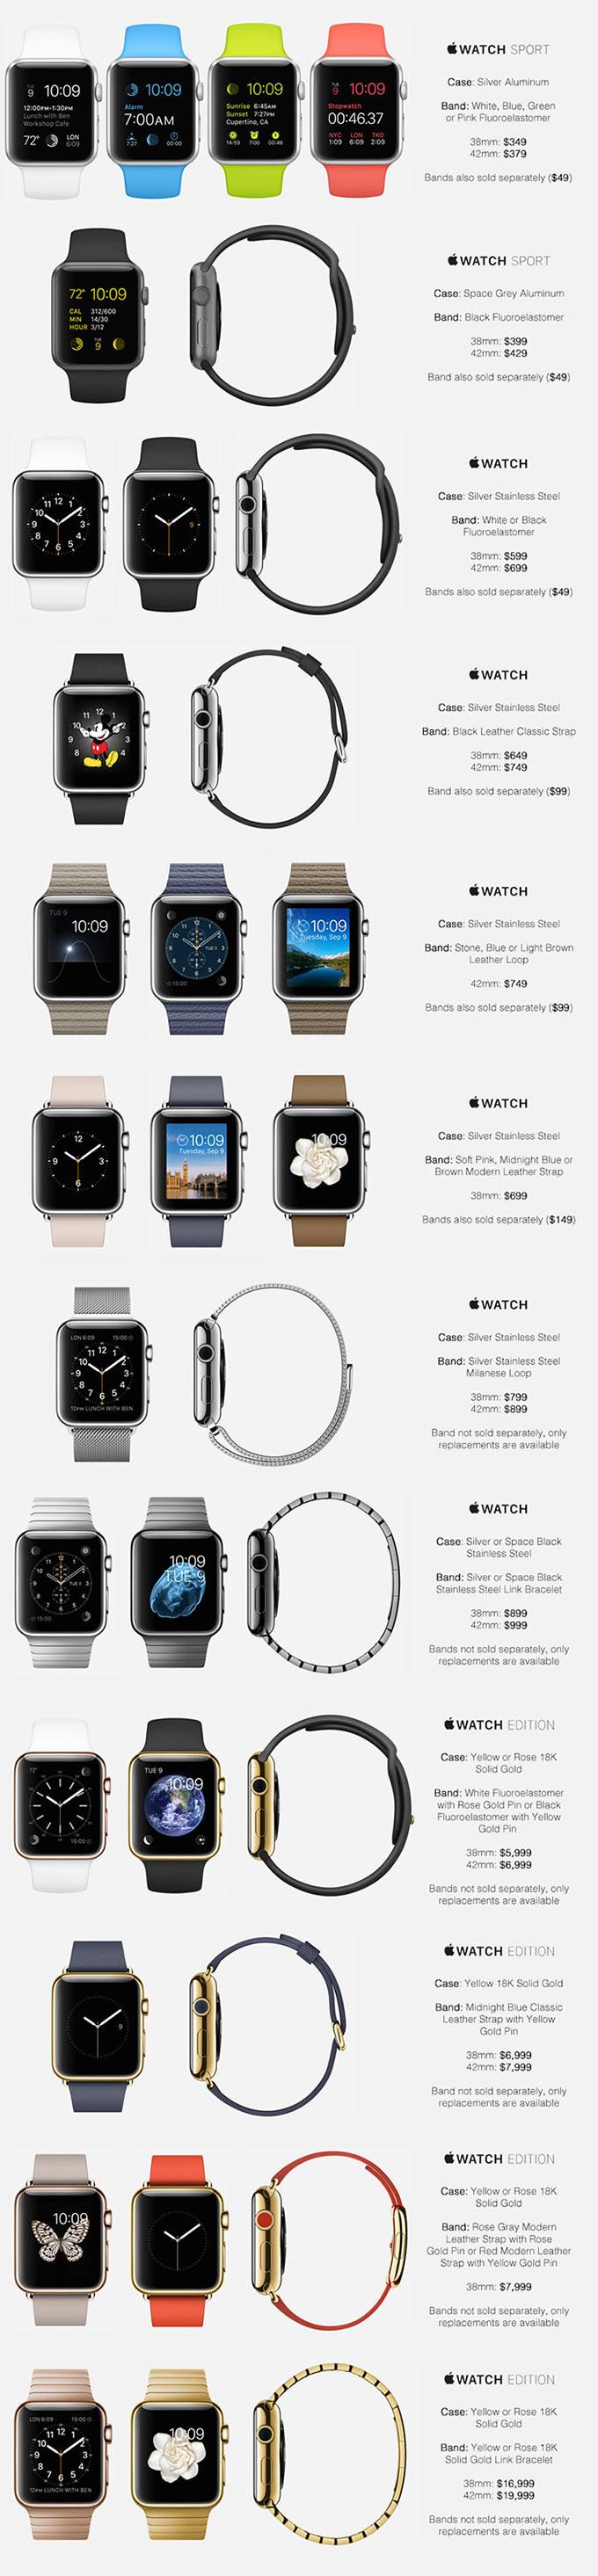 02-2-Apple-Watch-Price